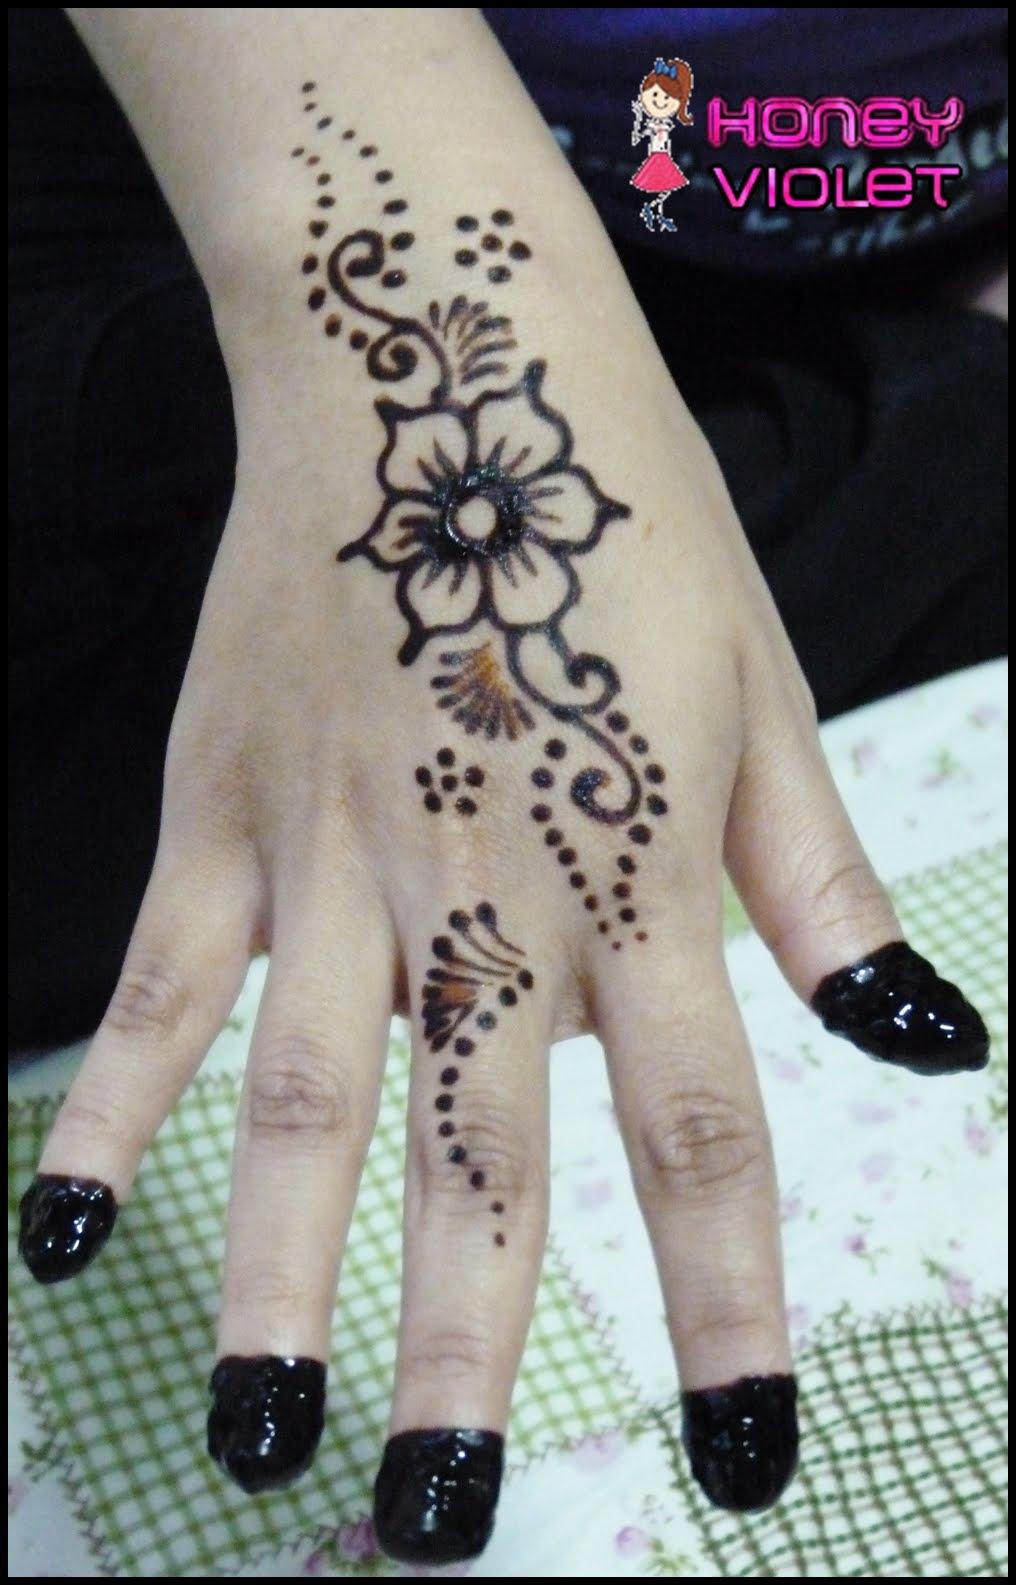 Cara Melukis Tangan Dengan Henna : melukis, tangan, dengan, henna, Lukisan, Simple, Mudah, Cikimm.com